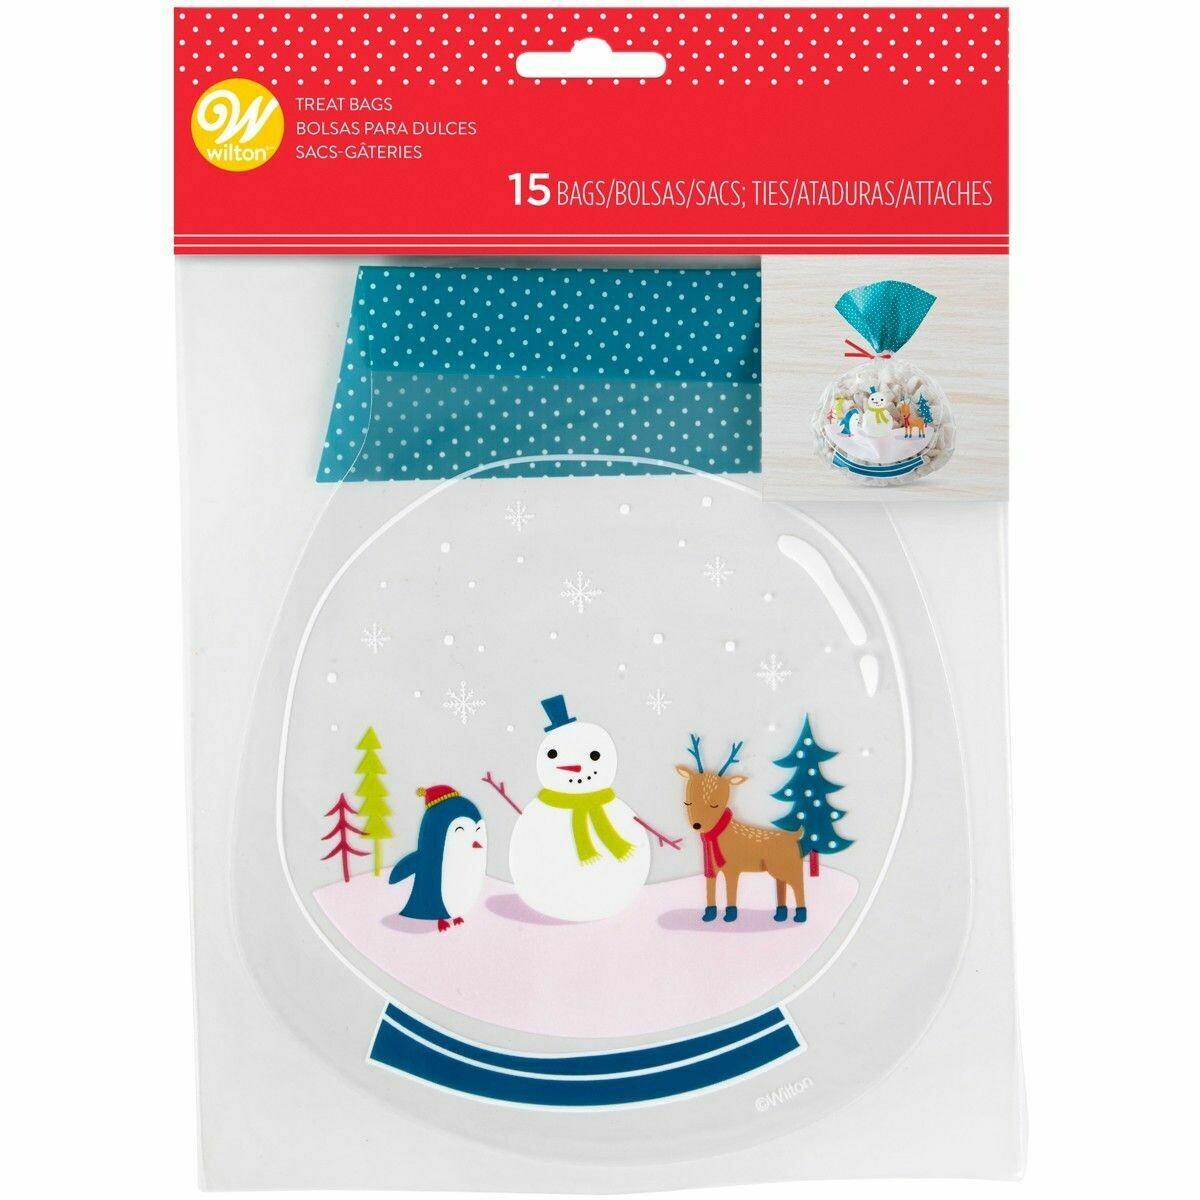 Wilton Christmas Treat Bags -SNOW GLOBE Pack of 15